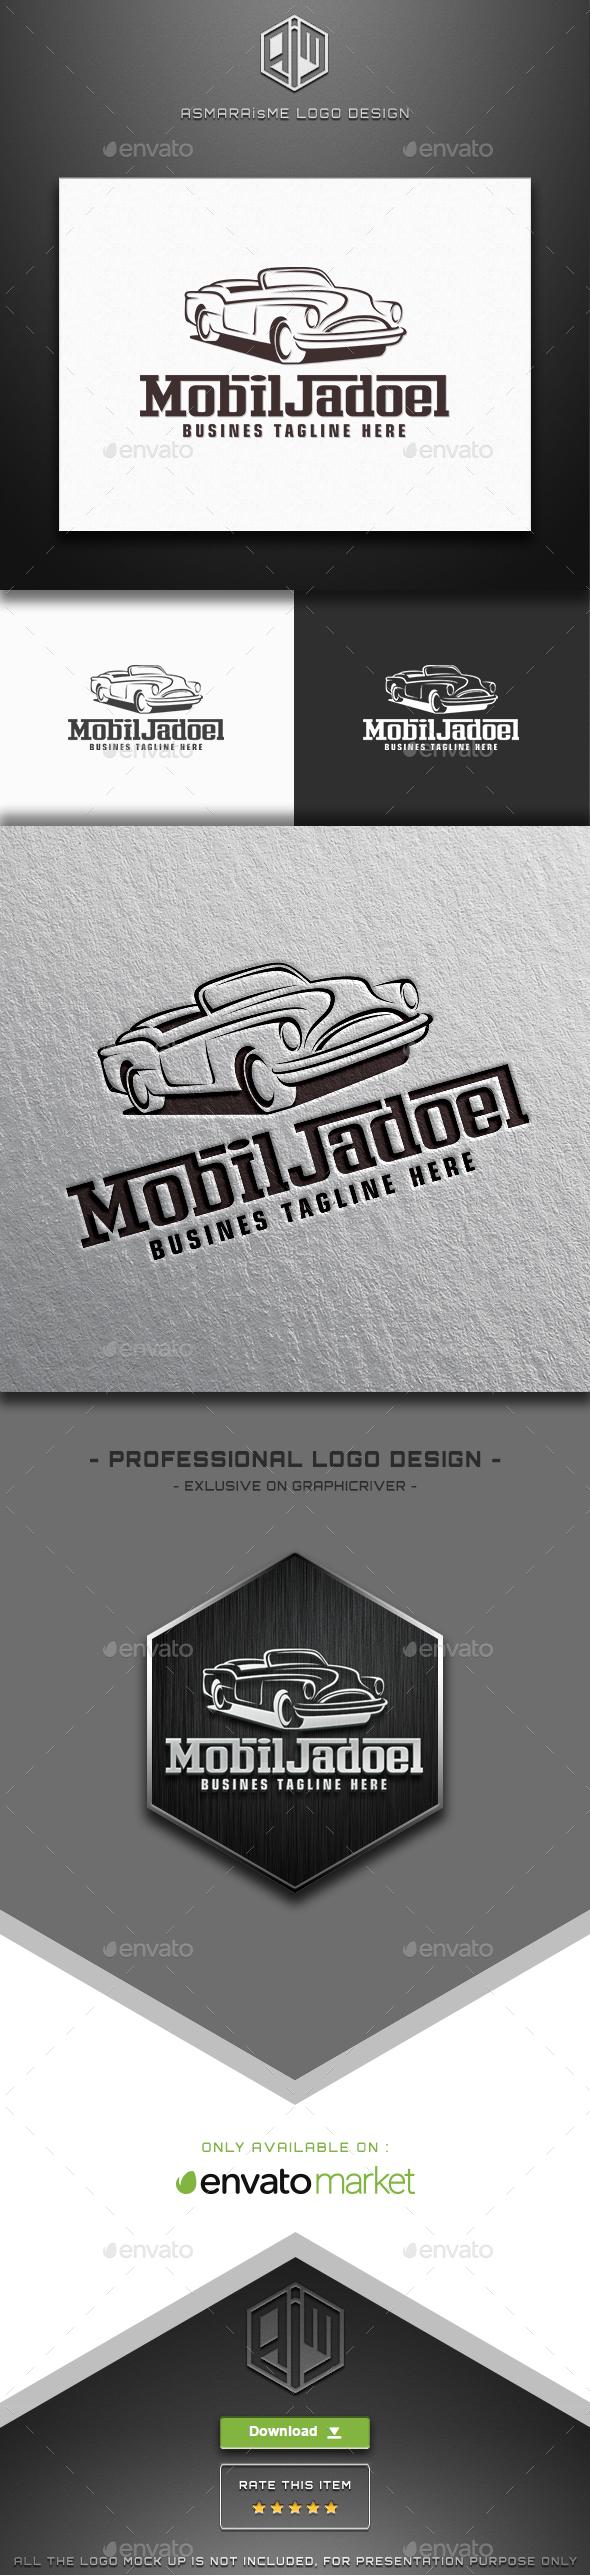 Mobil Jadoel - Vintage Car Logo